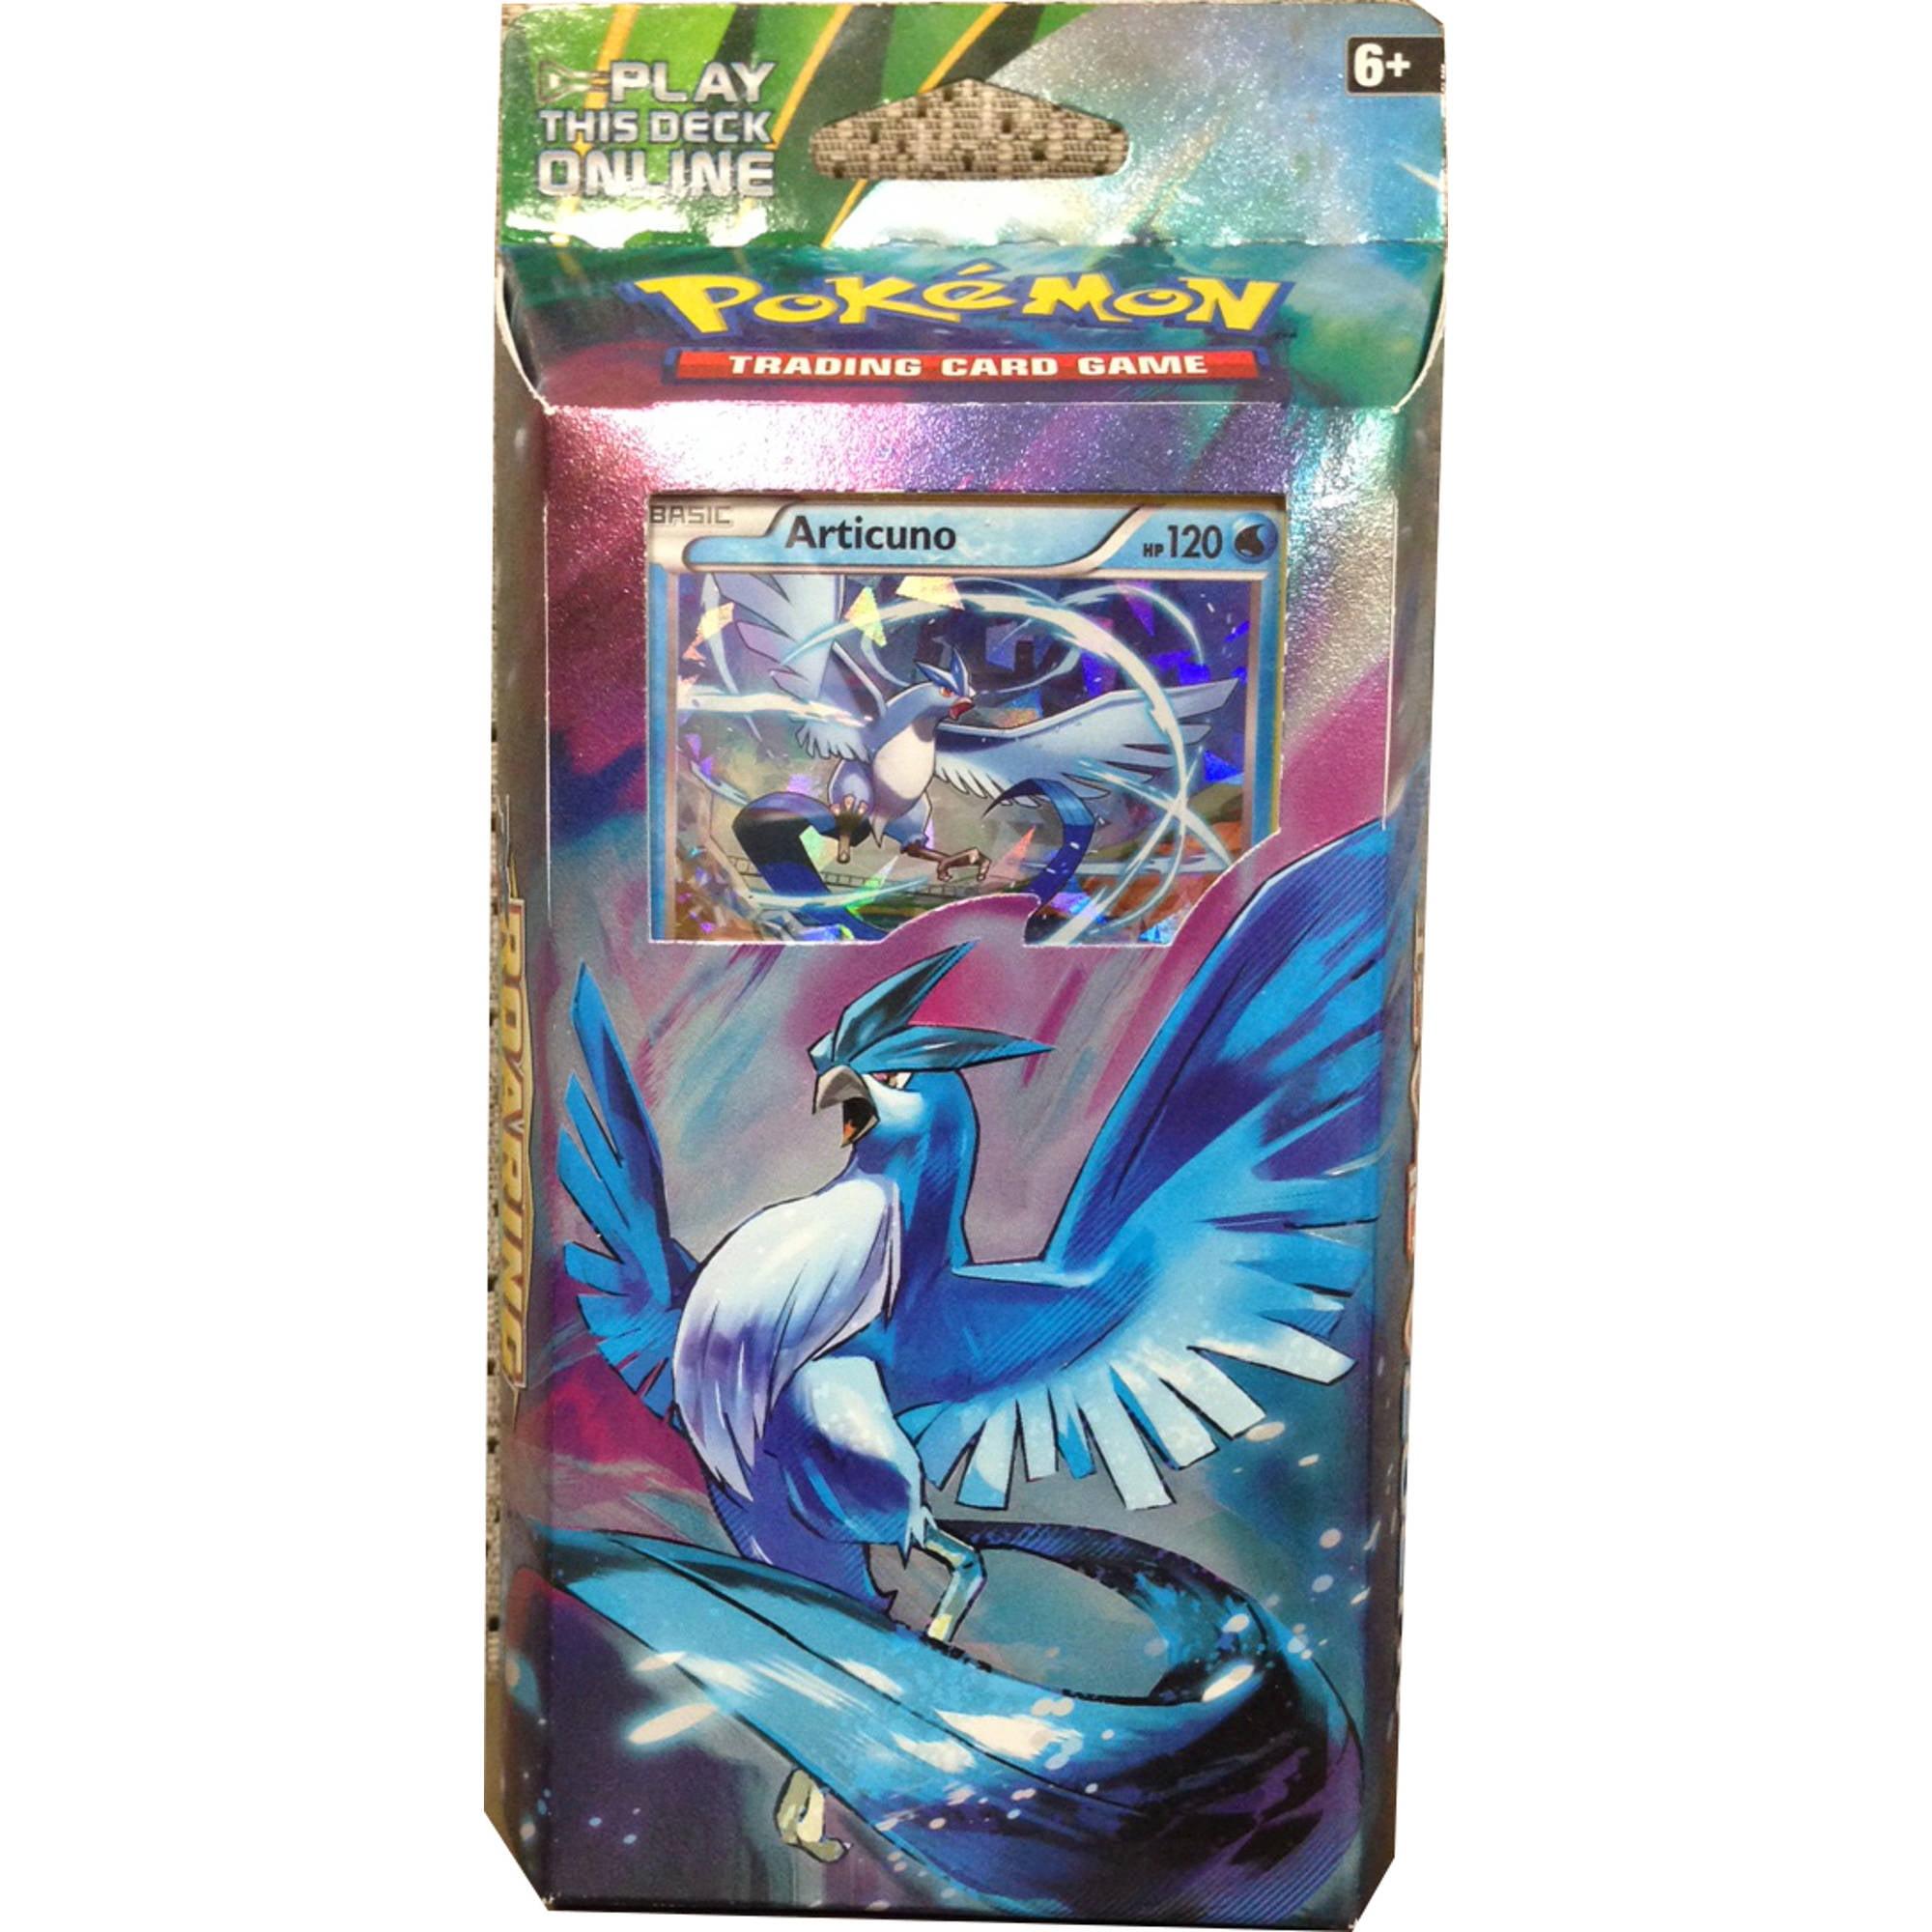 Pokemon X & Y 6 Theme Deck - Walmart.com